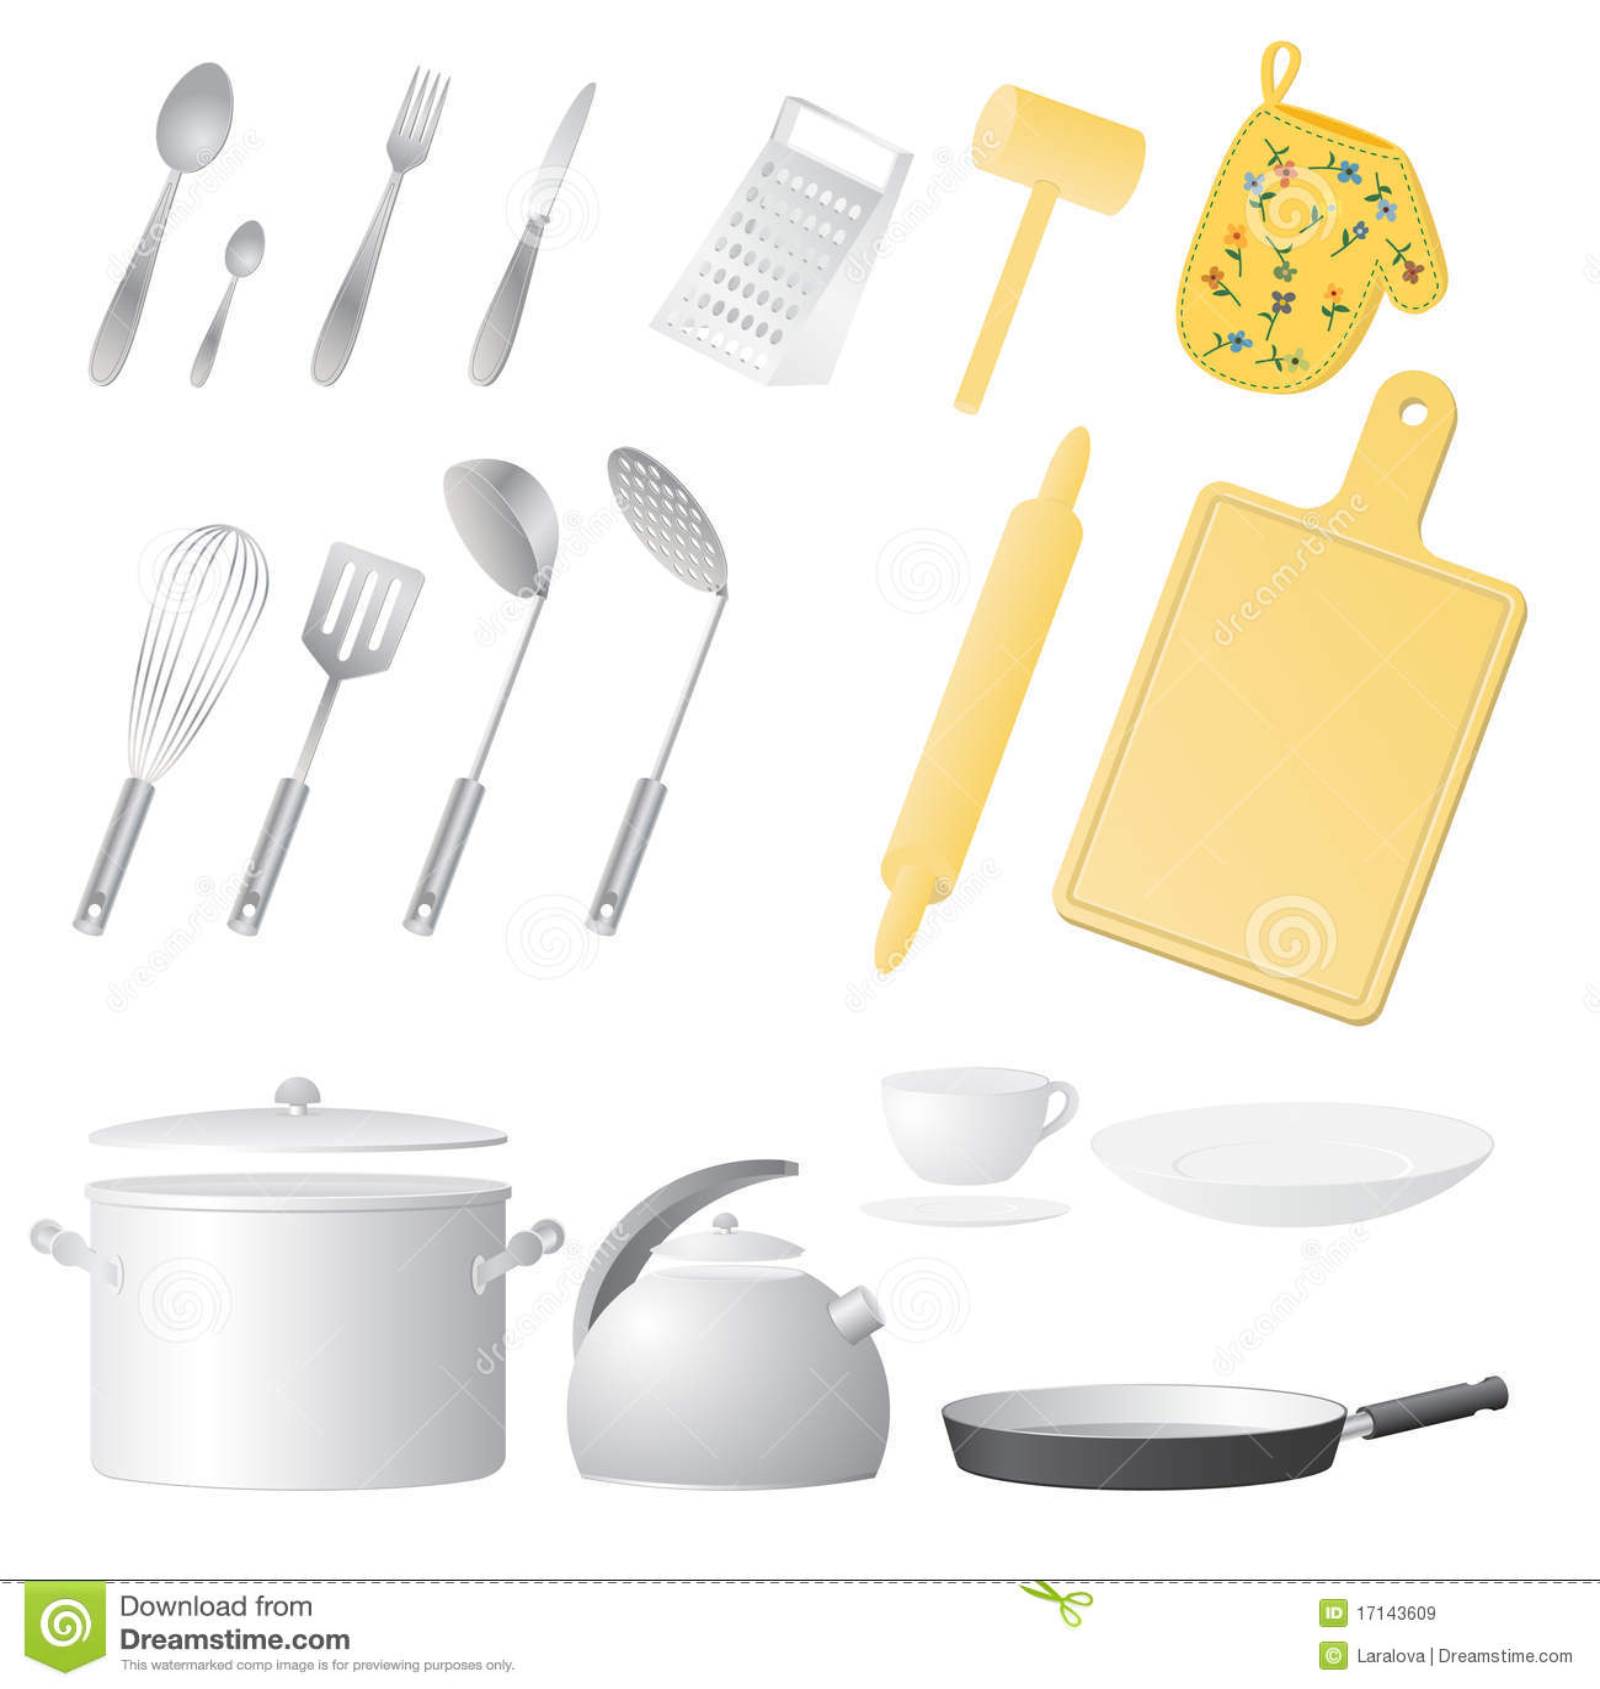 Dream Kitchen Utensils: Kitchen Utensils Stock Vector. Illustration Of Kitchenware